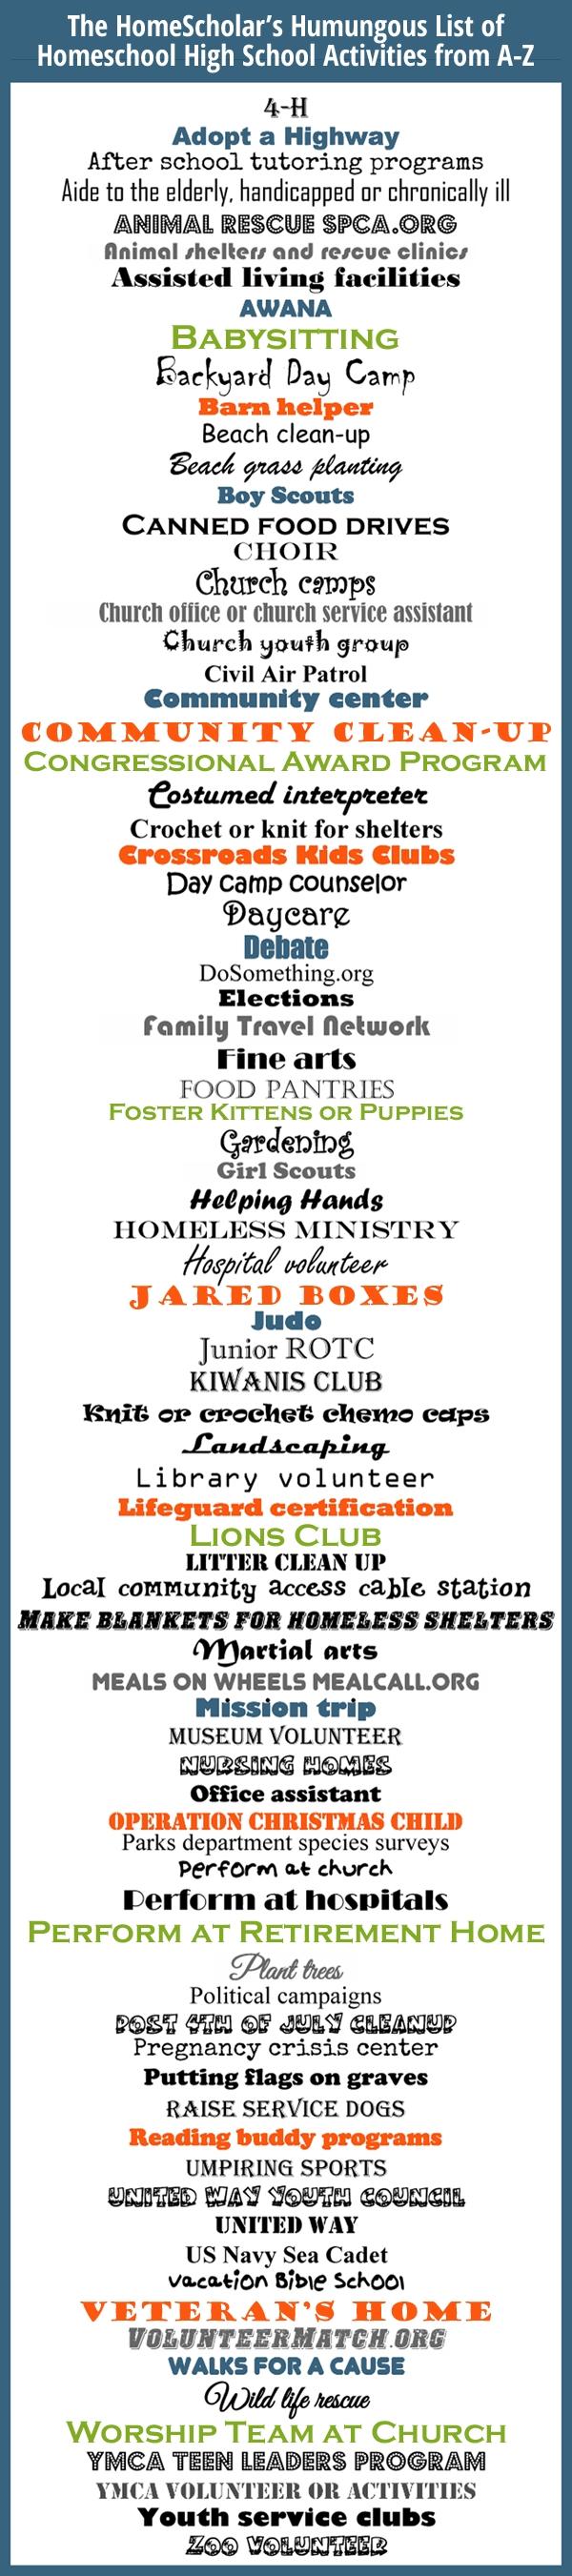 10 Lovely Community Service Ideas For High School pinlee binz the homescholar on homeschool infographics 1